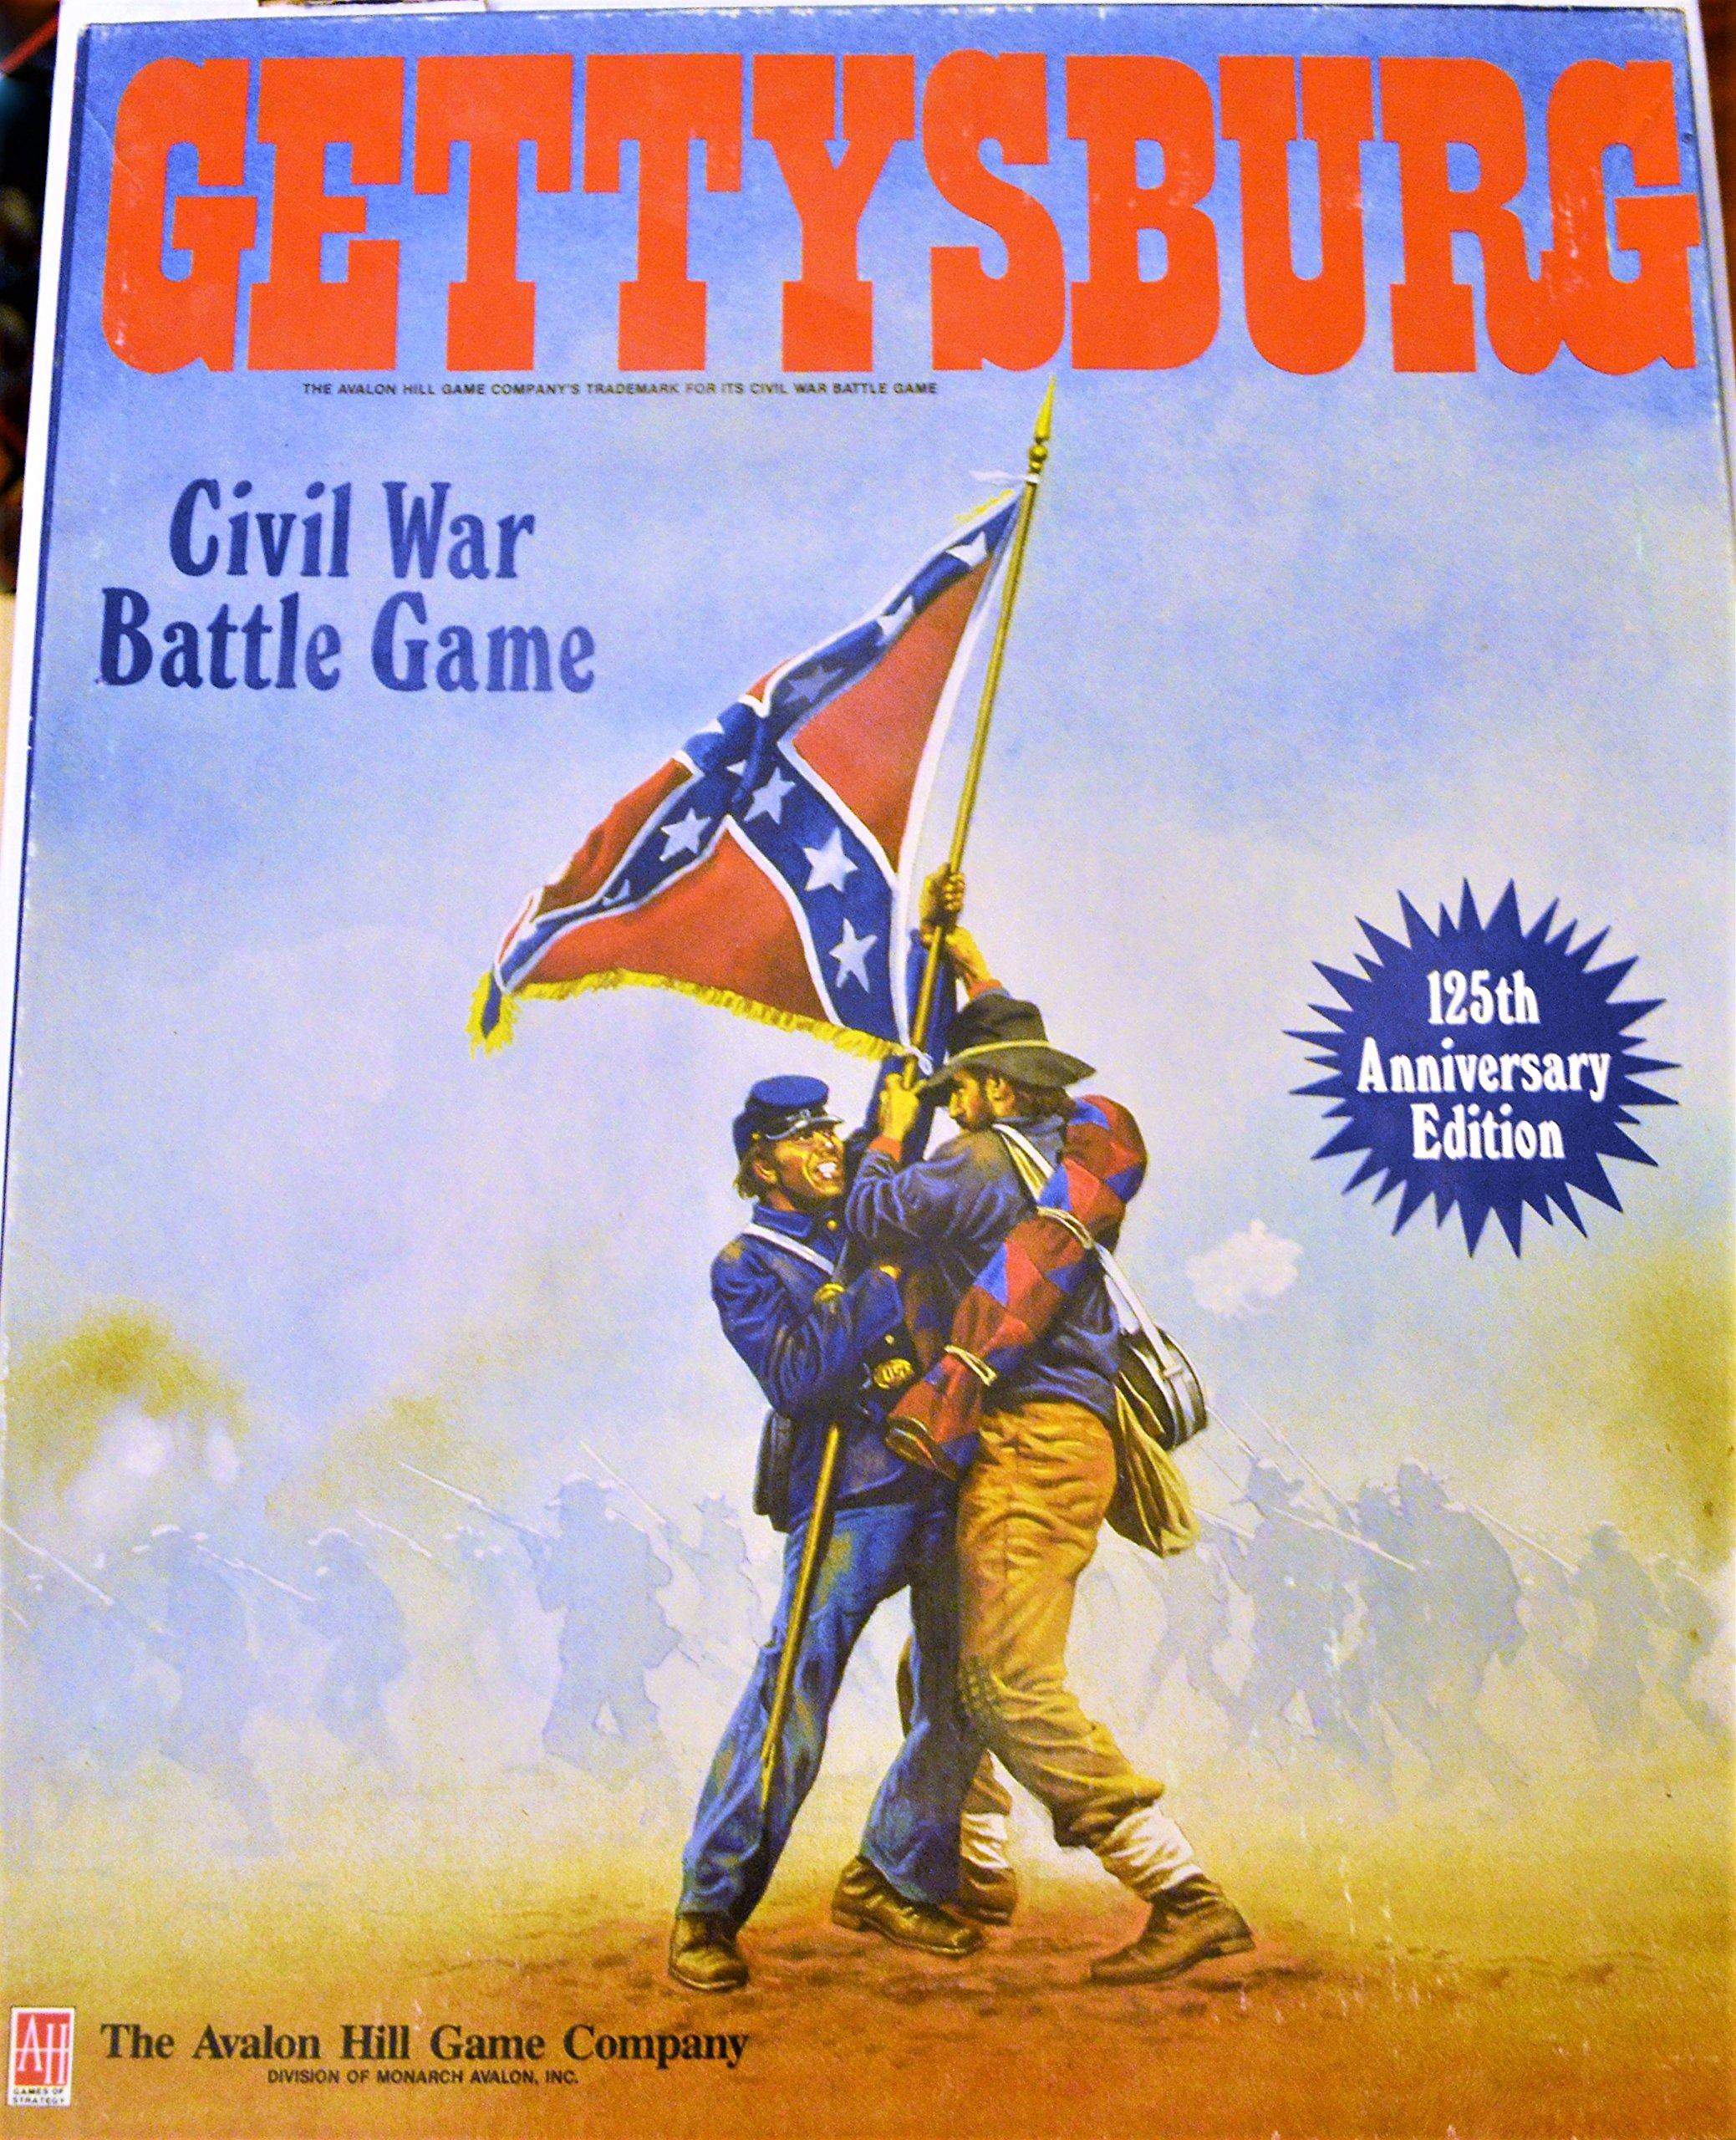 Gettysburg Civil War Battle Game 125th Anniversary Edition by AH Avalon Hill